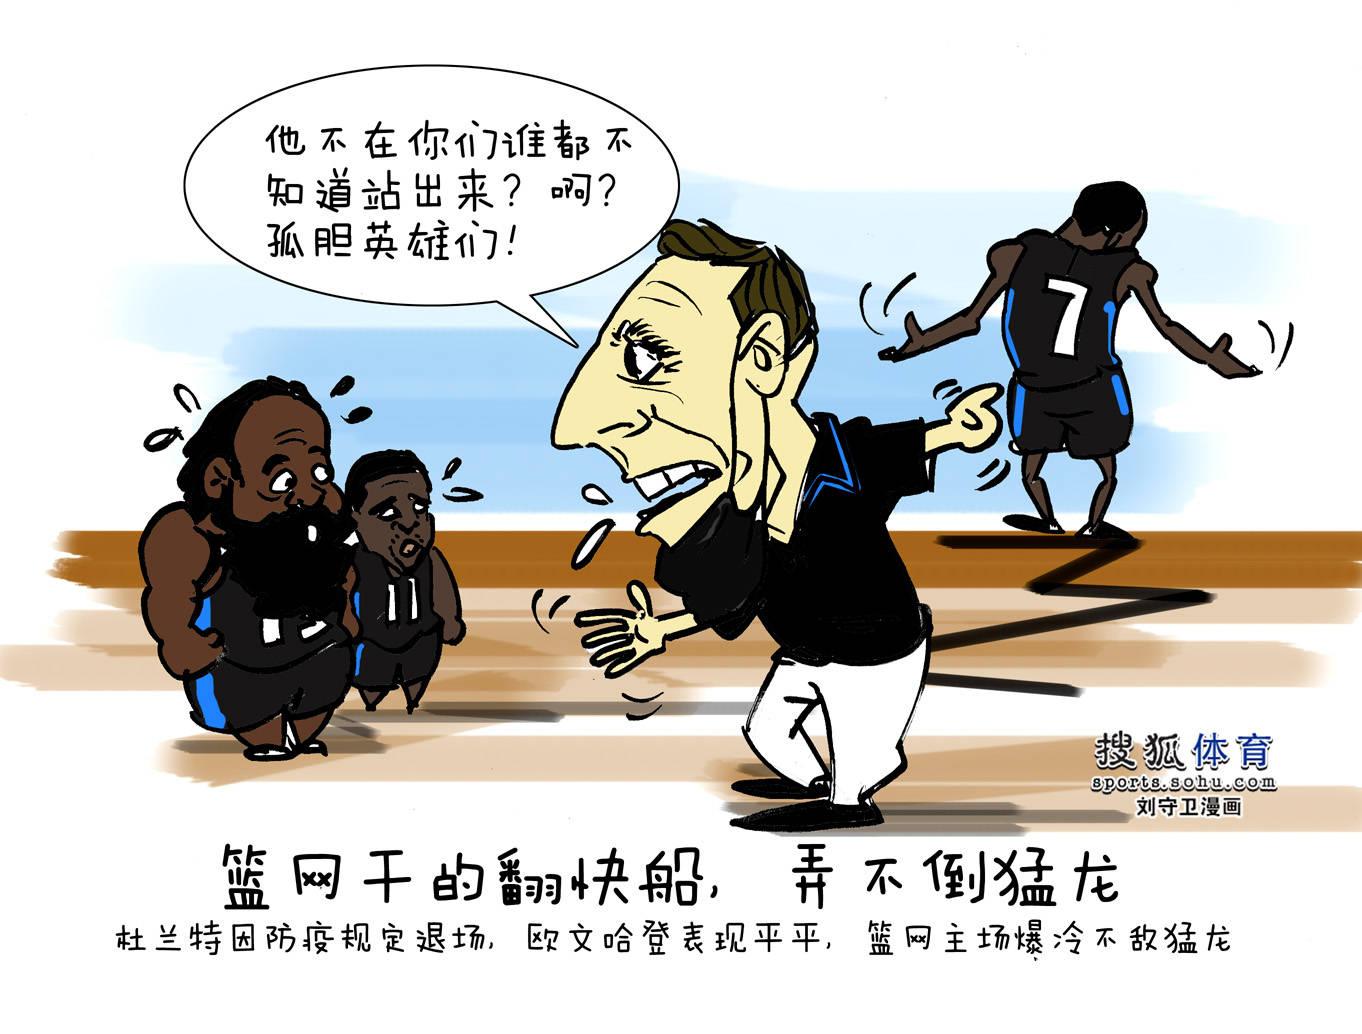 NBA漫画-篮网干的翻快船,打不倒猛龙